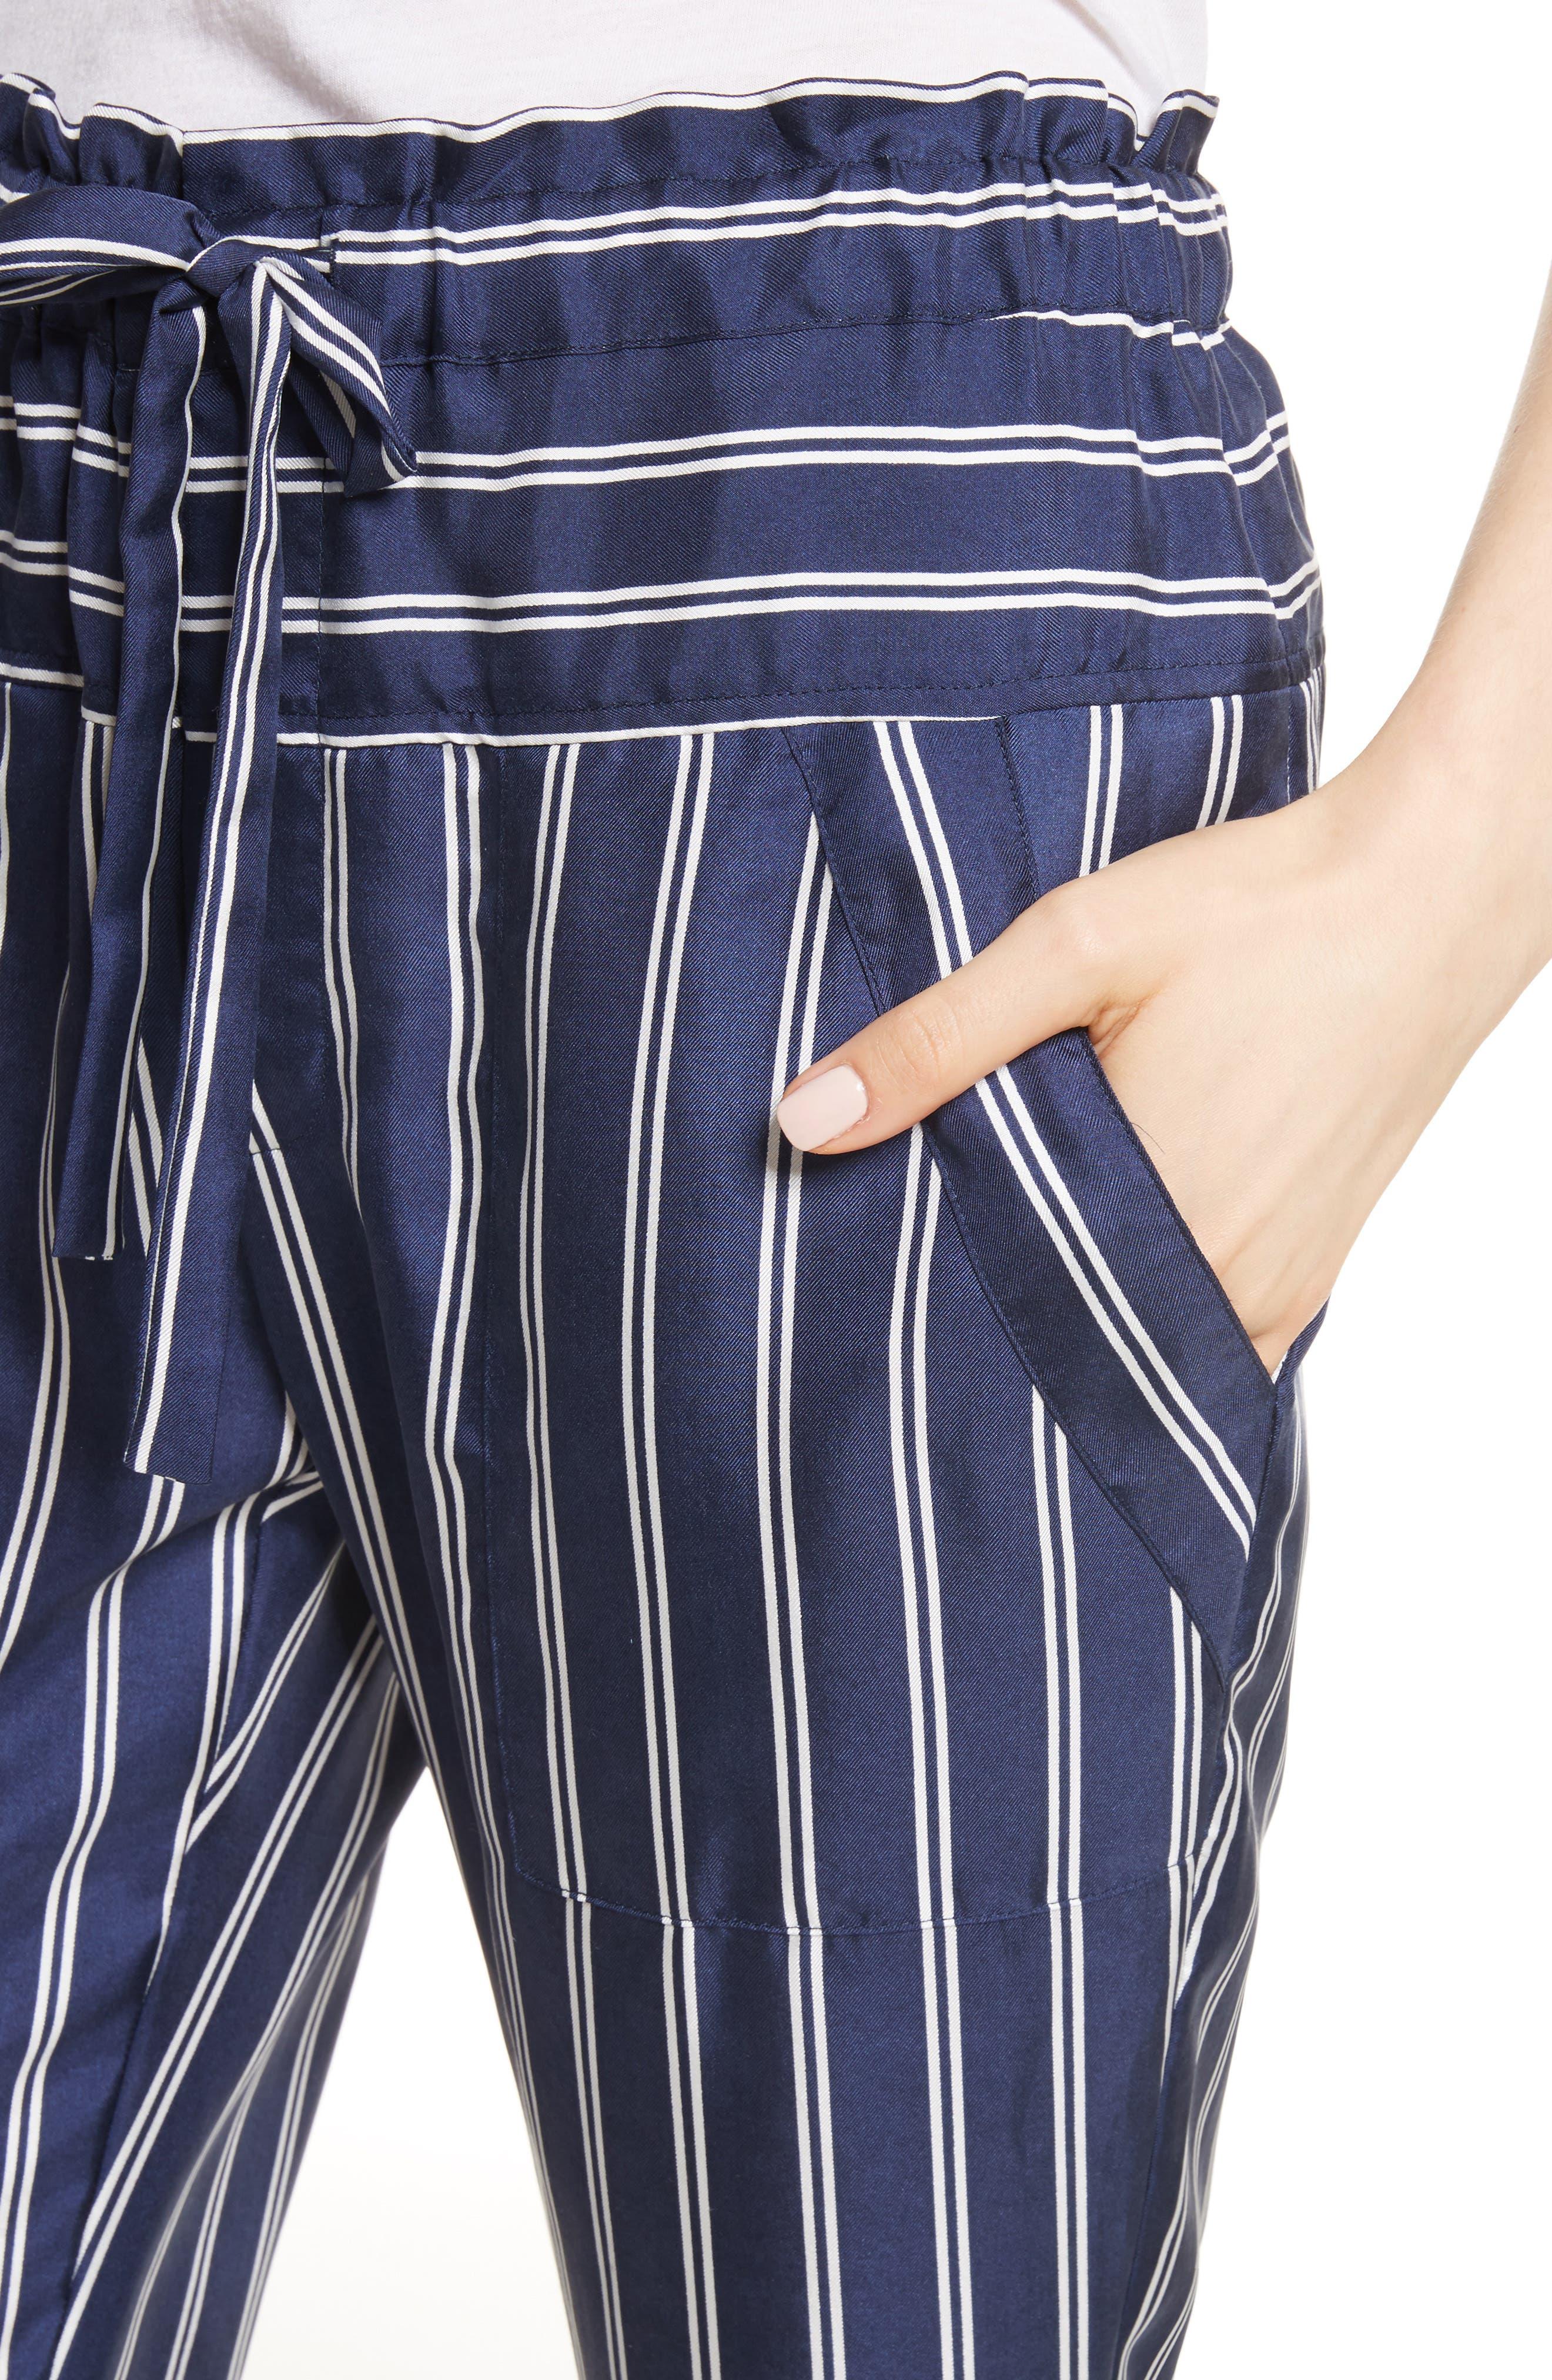 Addiena Stripe Silk Pants,                             Alternate thumbnail 4, color,                             418